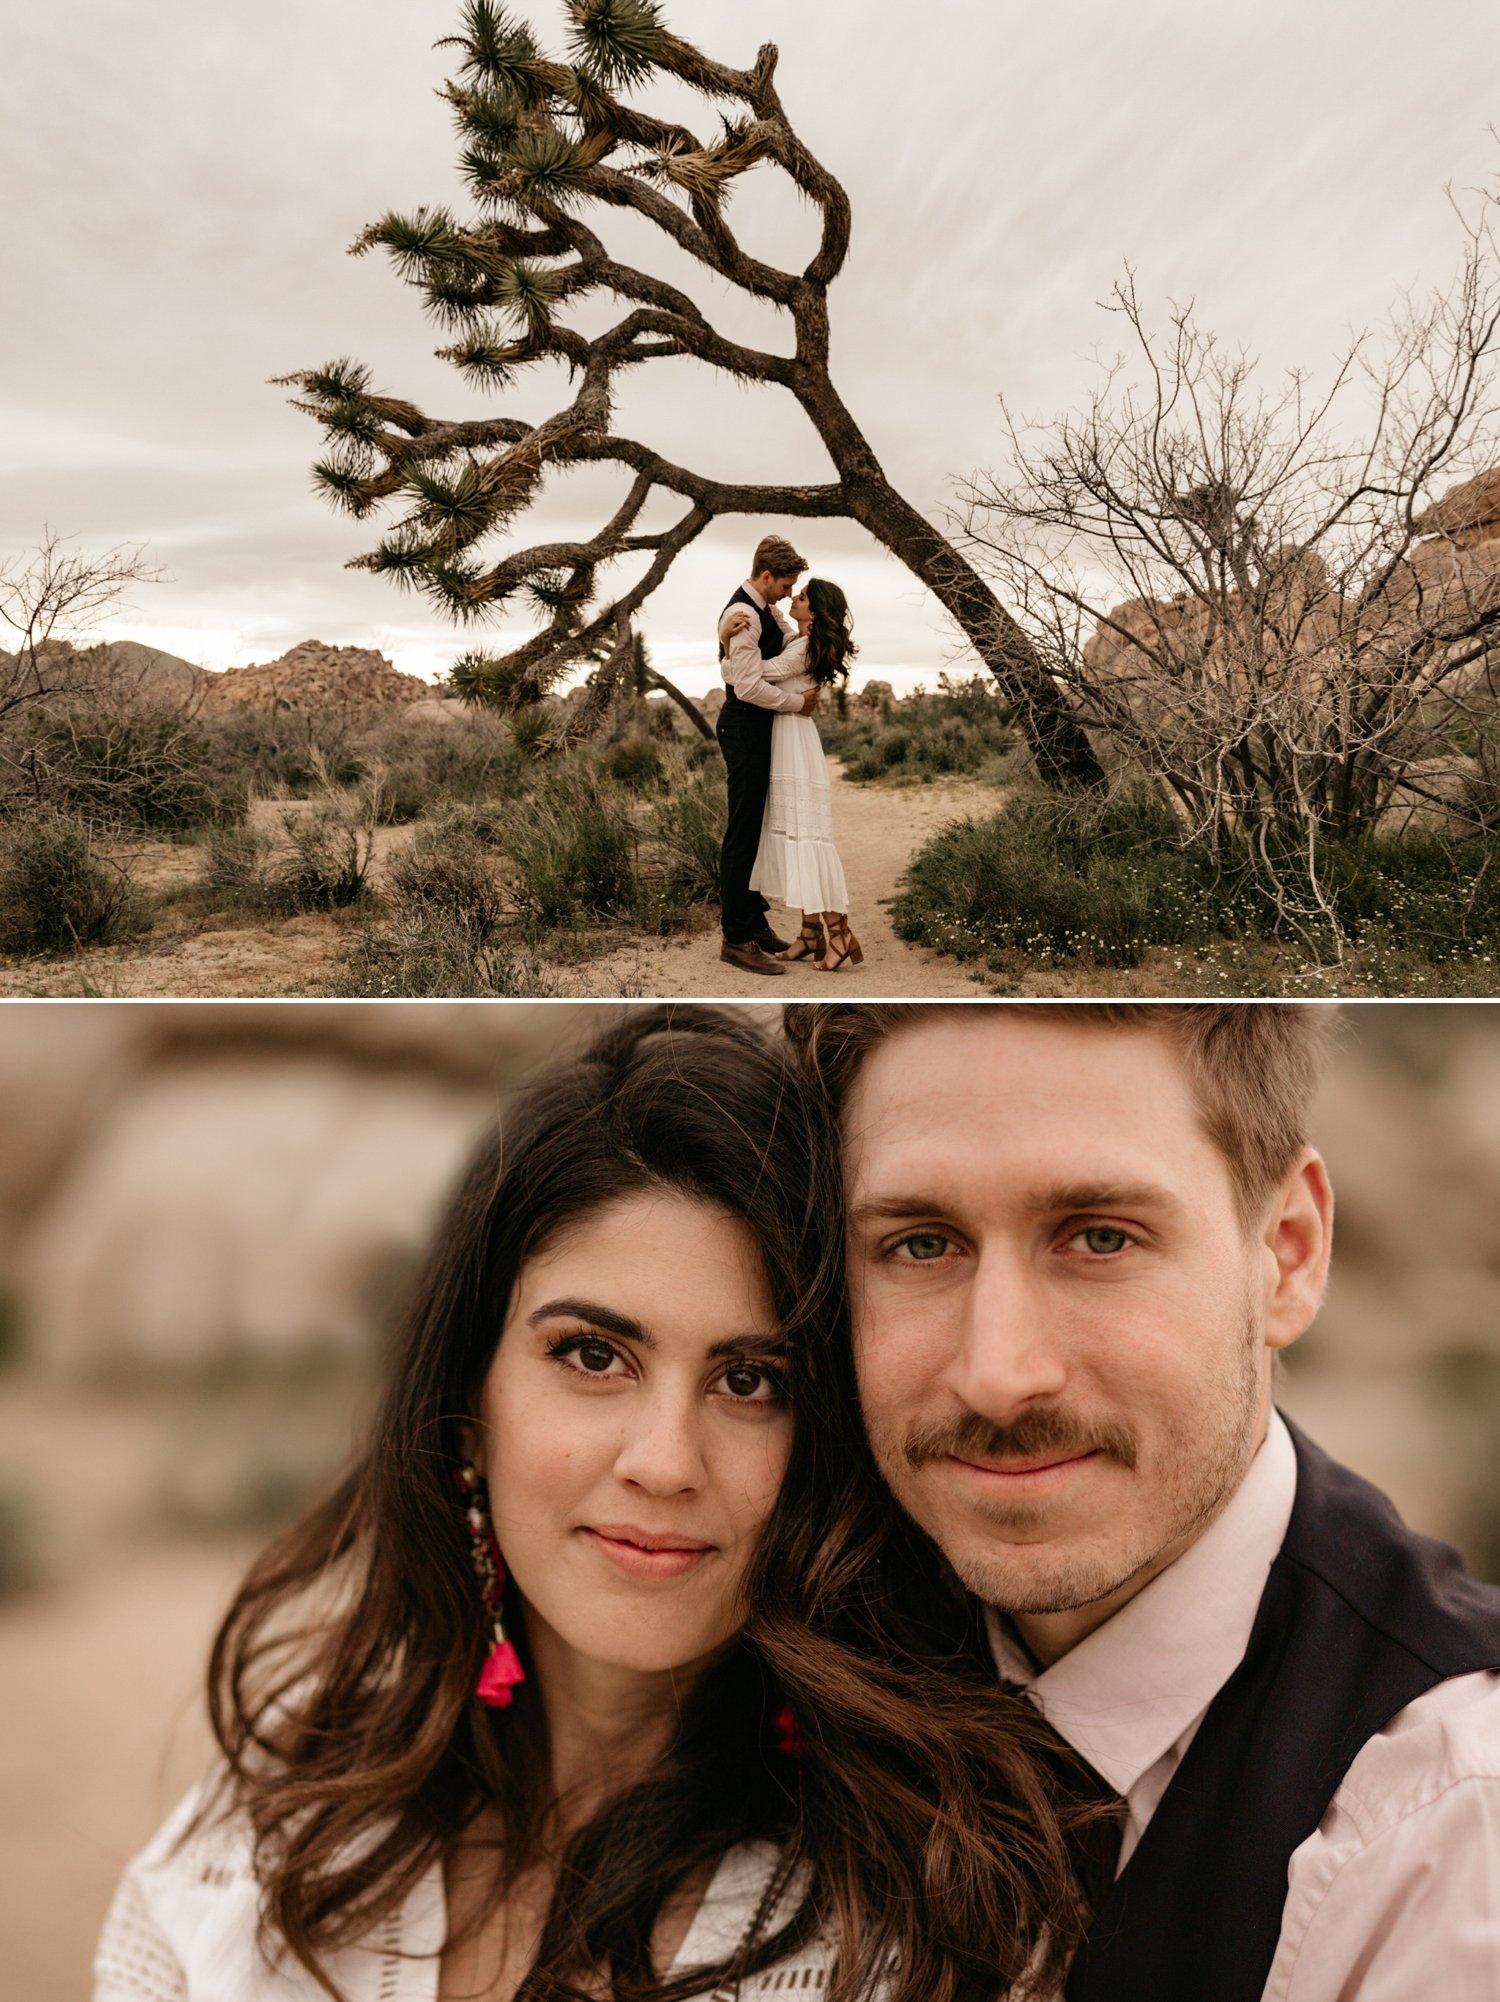 Desert engagement in Joshua Tree